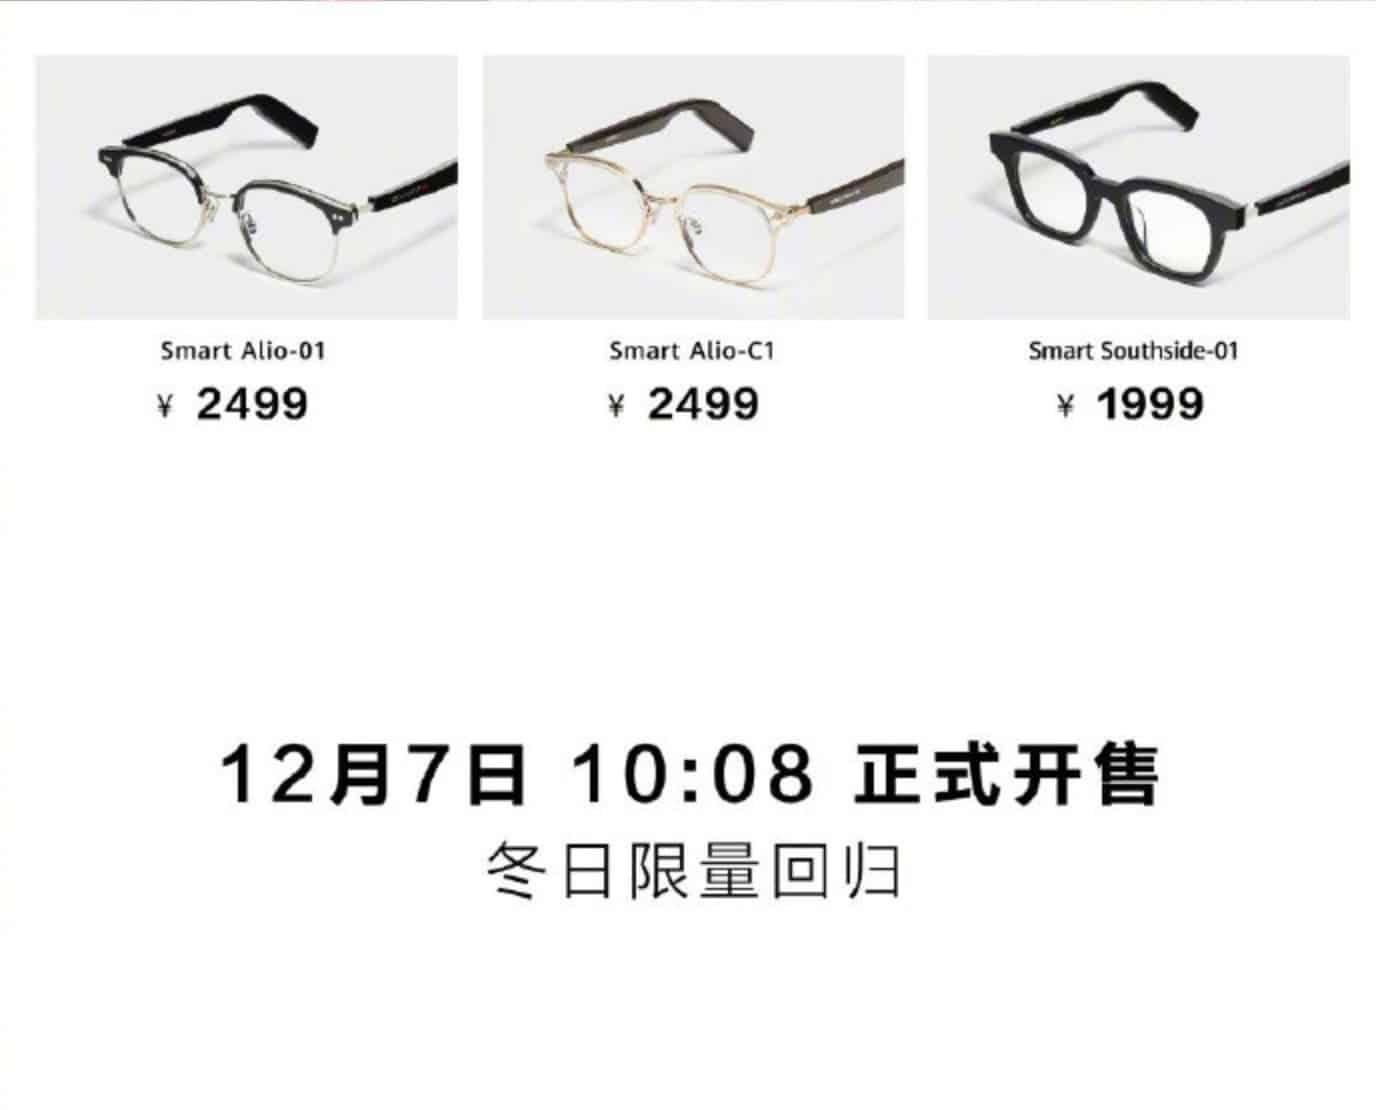 Huawei EyeWear Smart Glasses Limited Edition Again on Sale